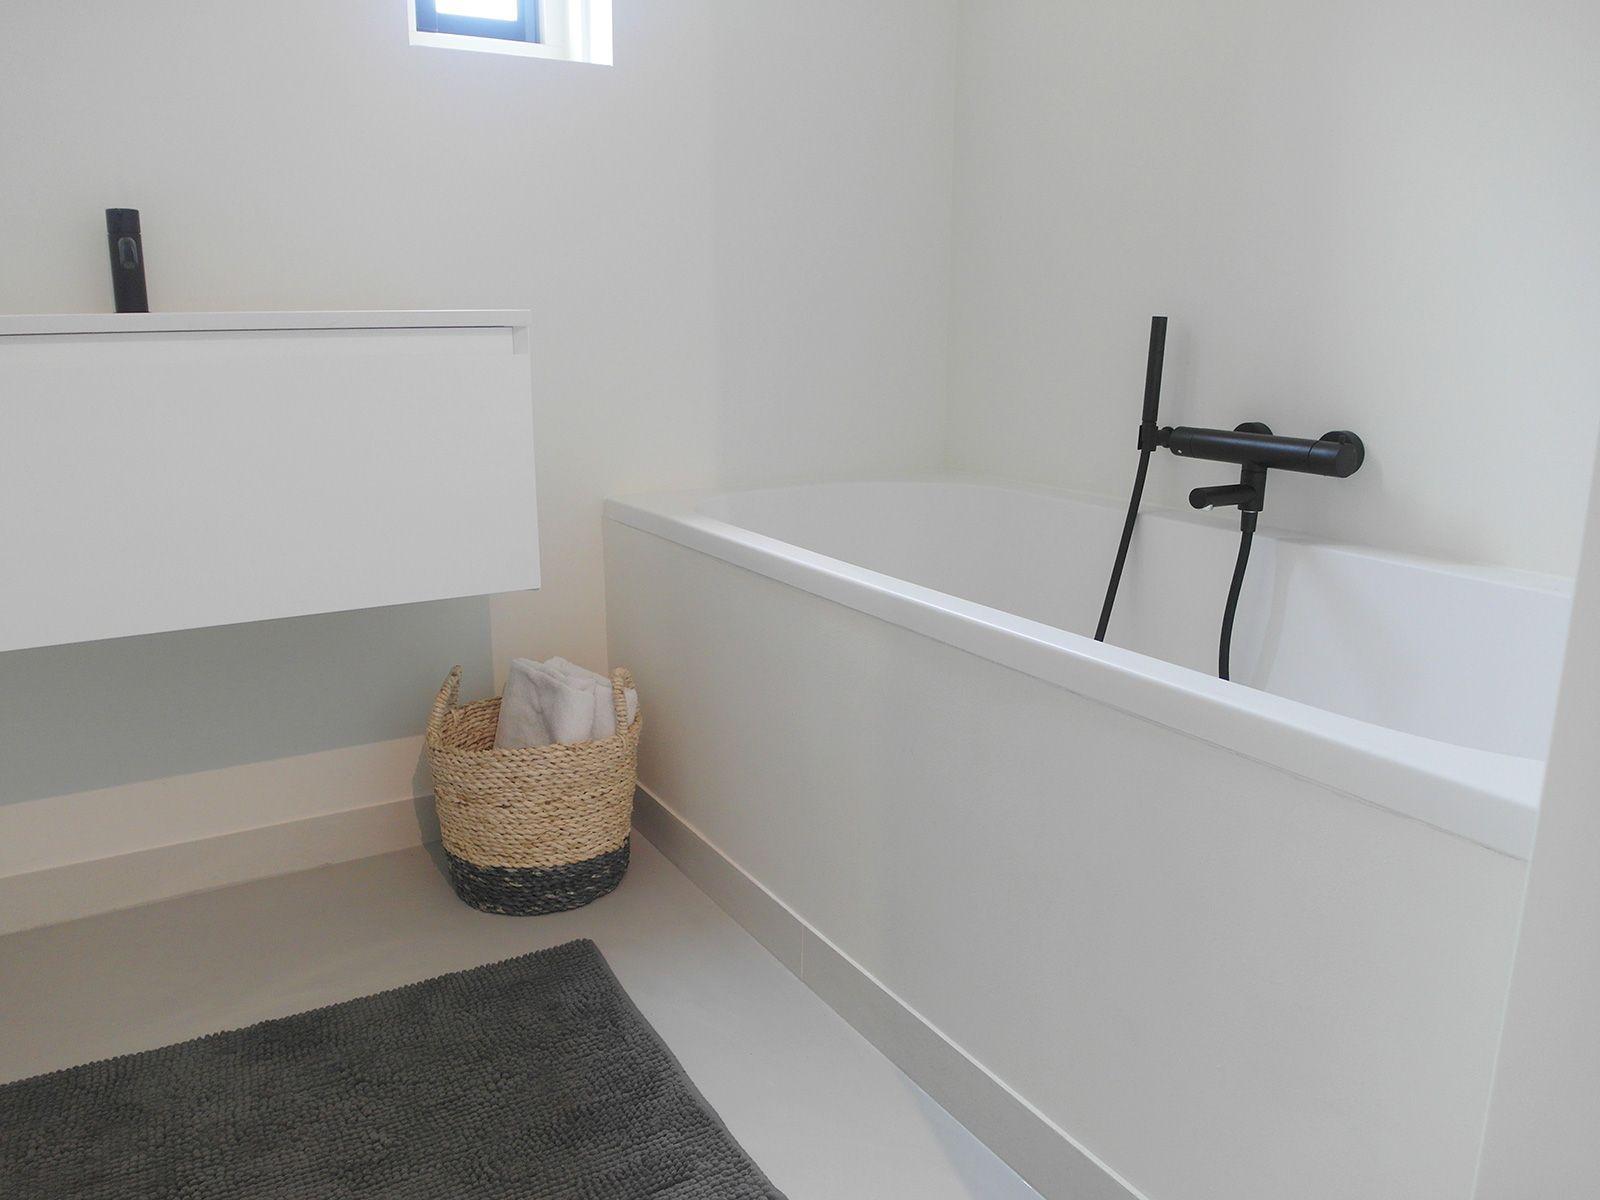 Welke Gietvloer Badkamer : Gietvloer in deze frisse witte badkamer in berkel en rodenrijs